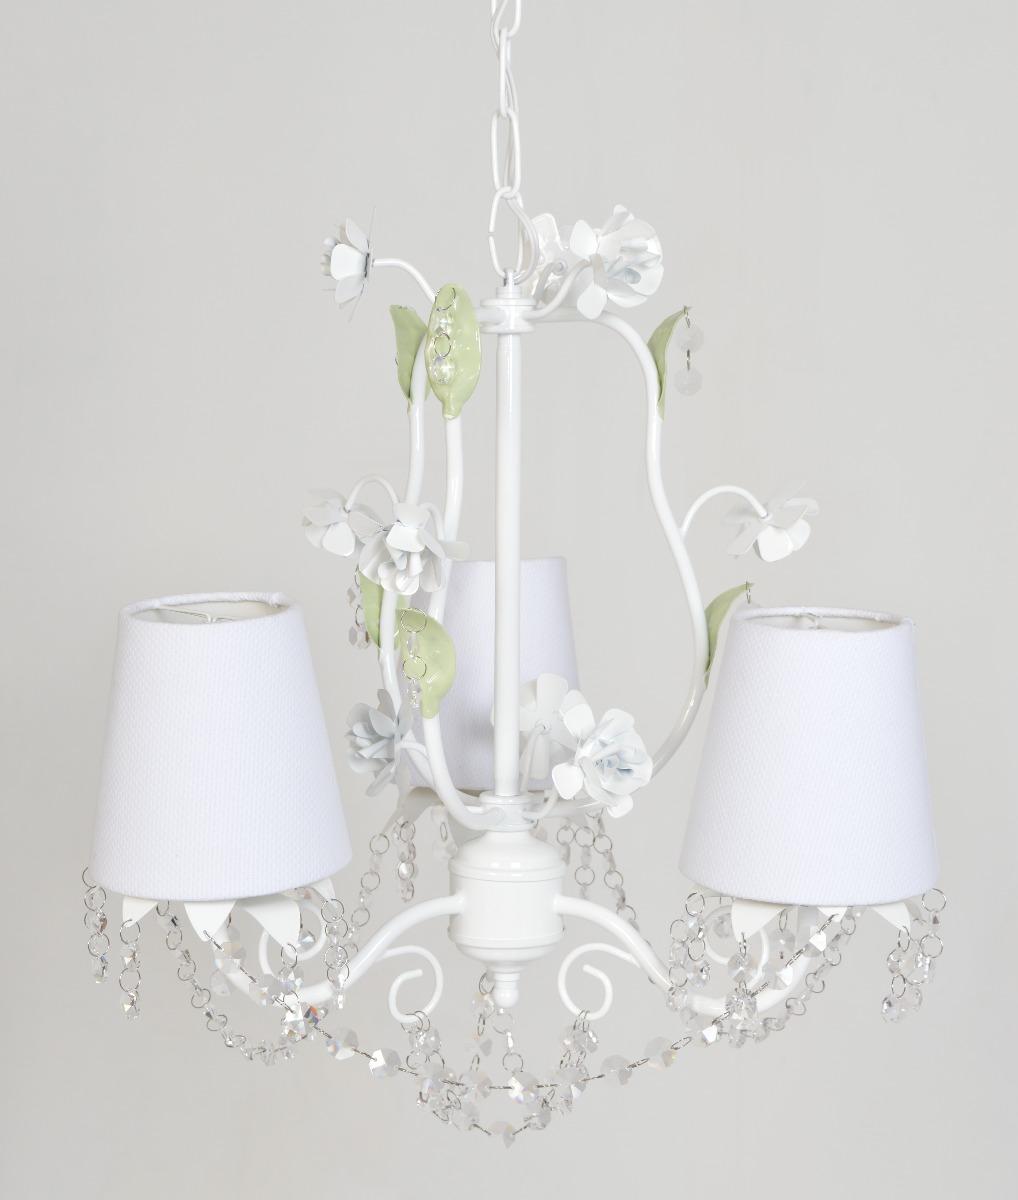 Luminaria Quarto Bebe Mercadolivre ~   Cristal Pendente Flor Menina Beb?  R$ 399,80 no MercadoLivre